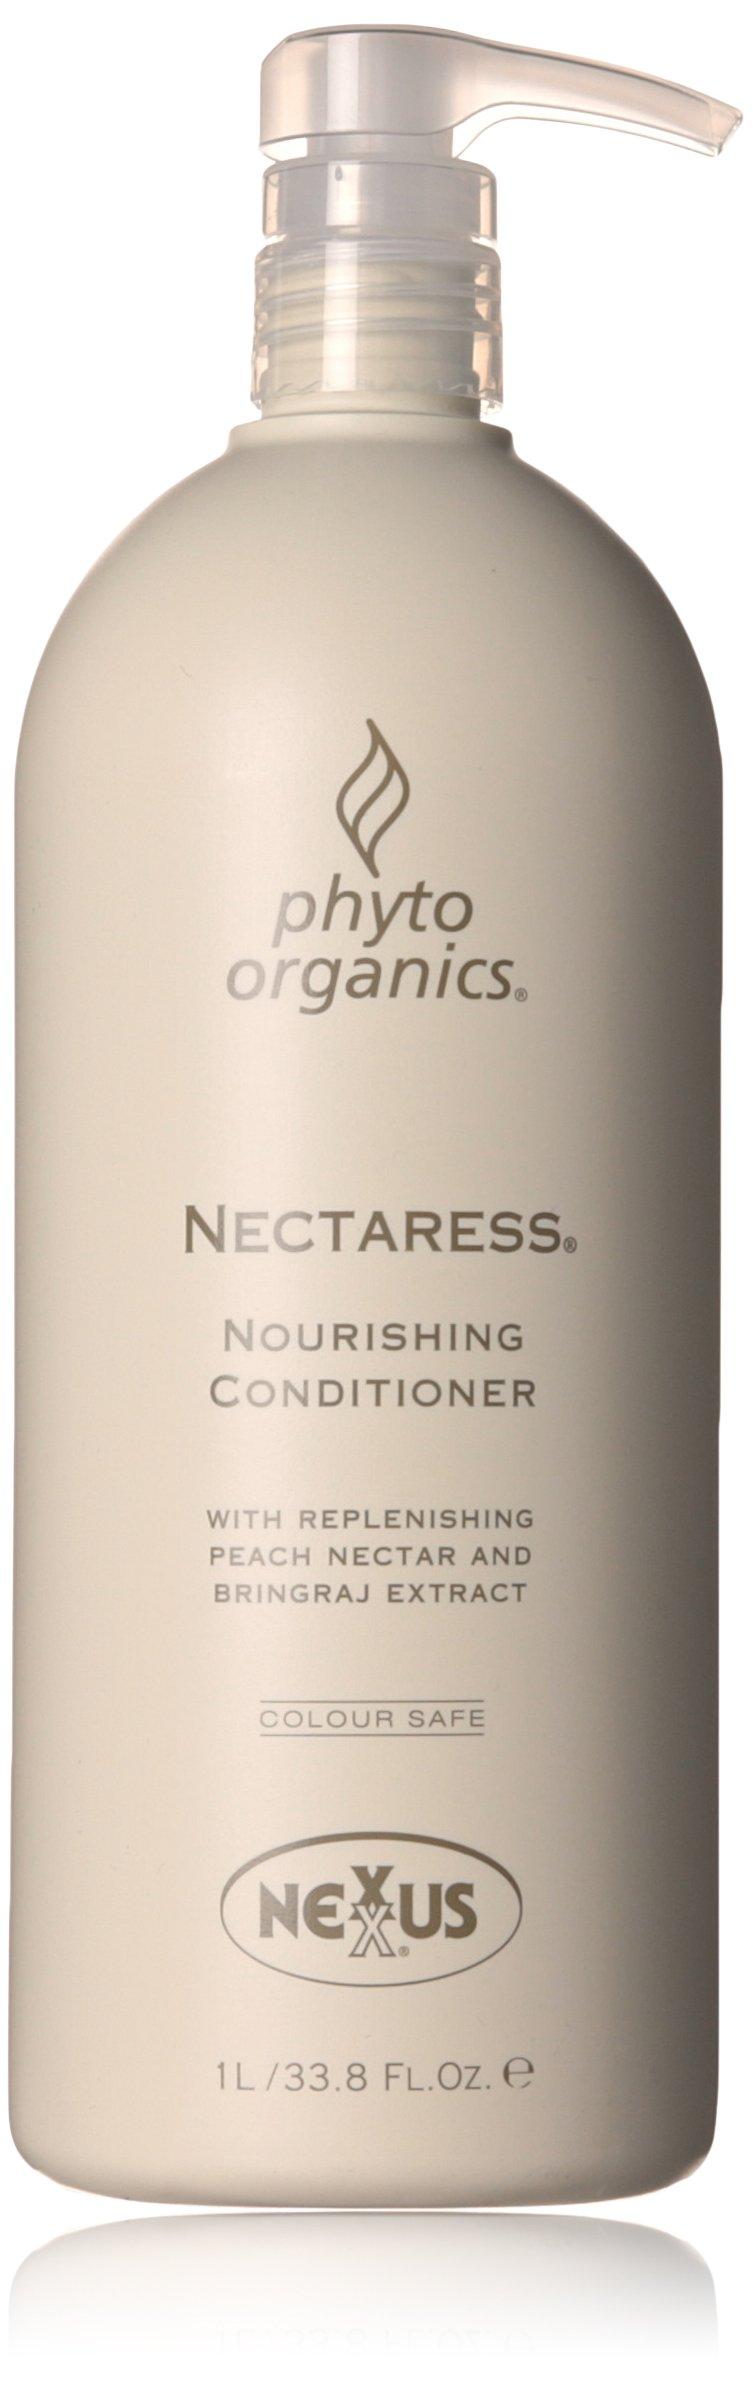 Nexxus Phyto Organics Nectaress Nourishing Conditioner, 33.8 Ounce